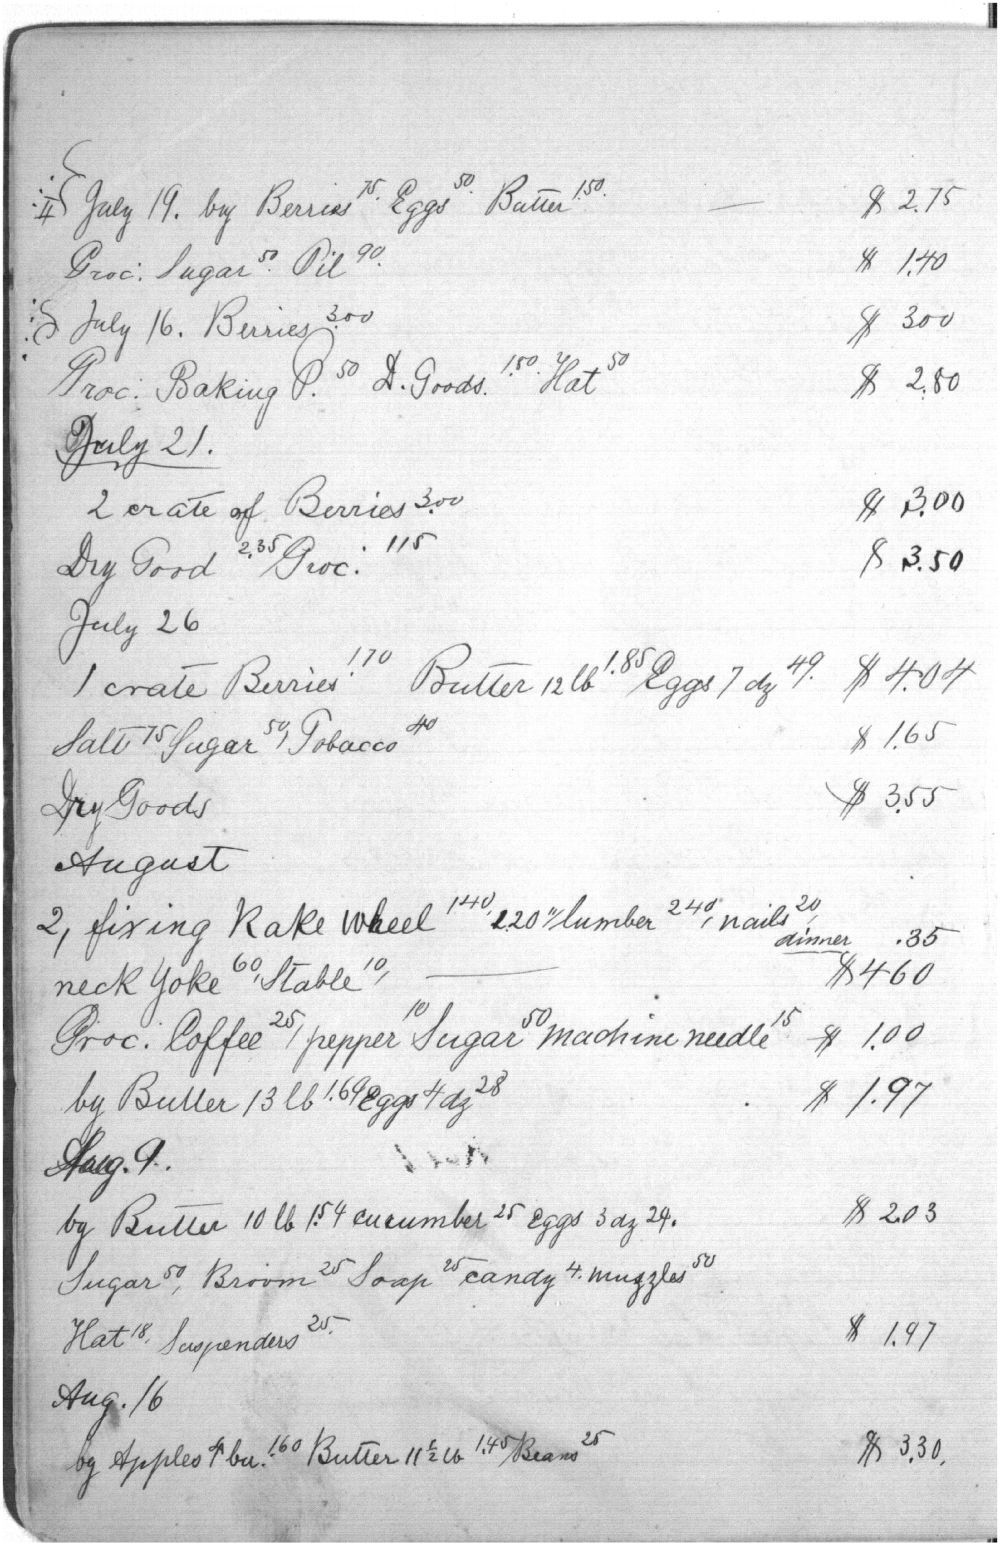 Augusta Bruchmiller memorandum book - 8